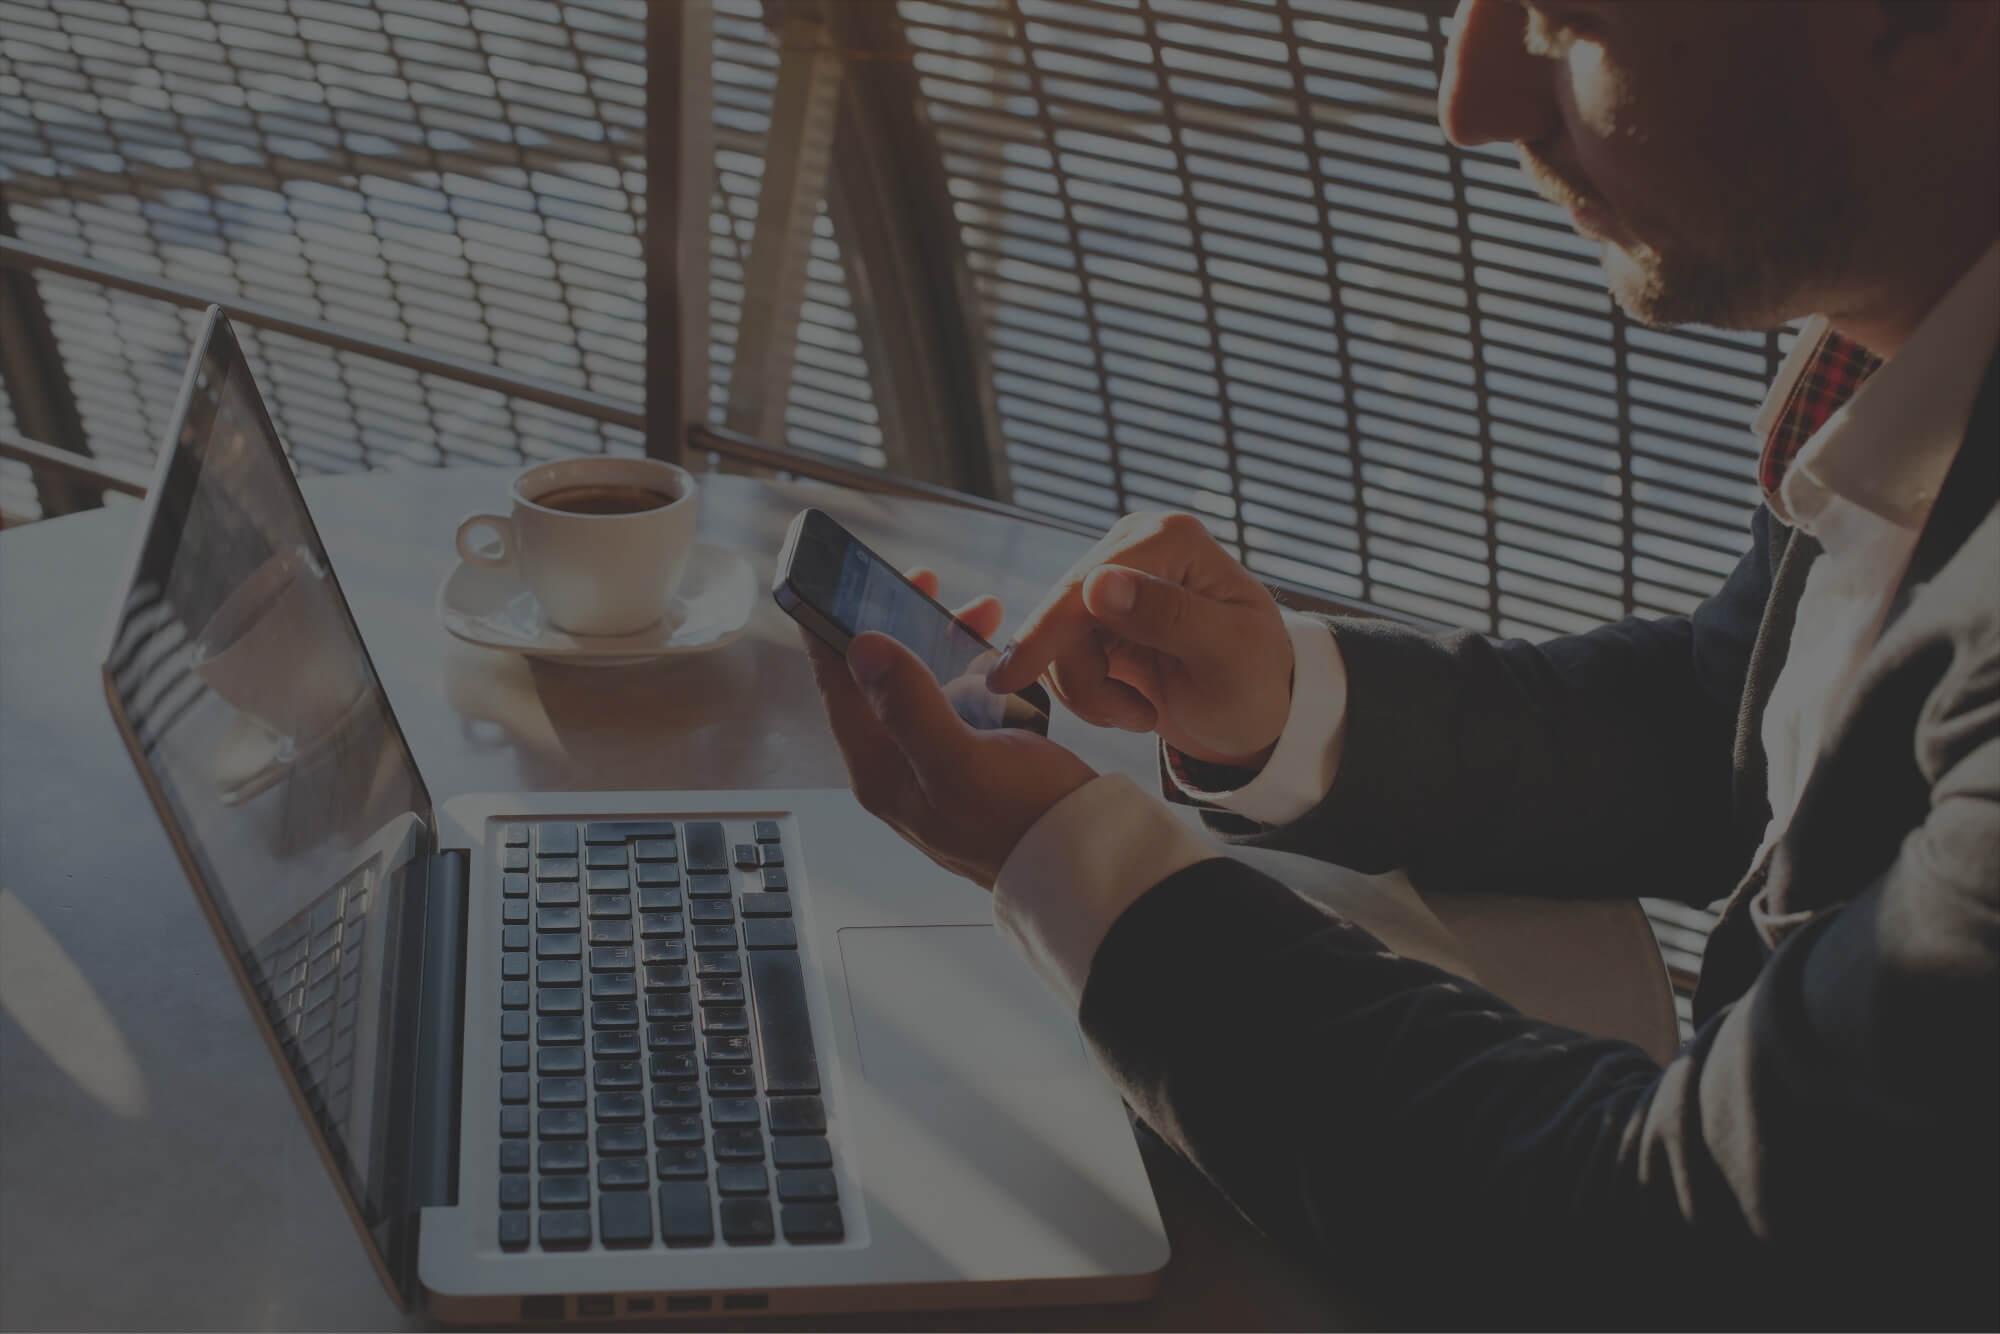 Fundamentals of Marketing in the Digital Age